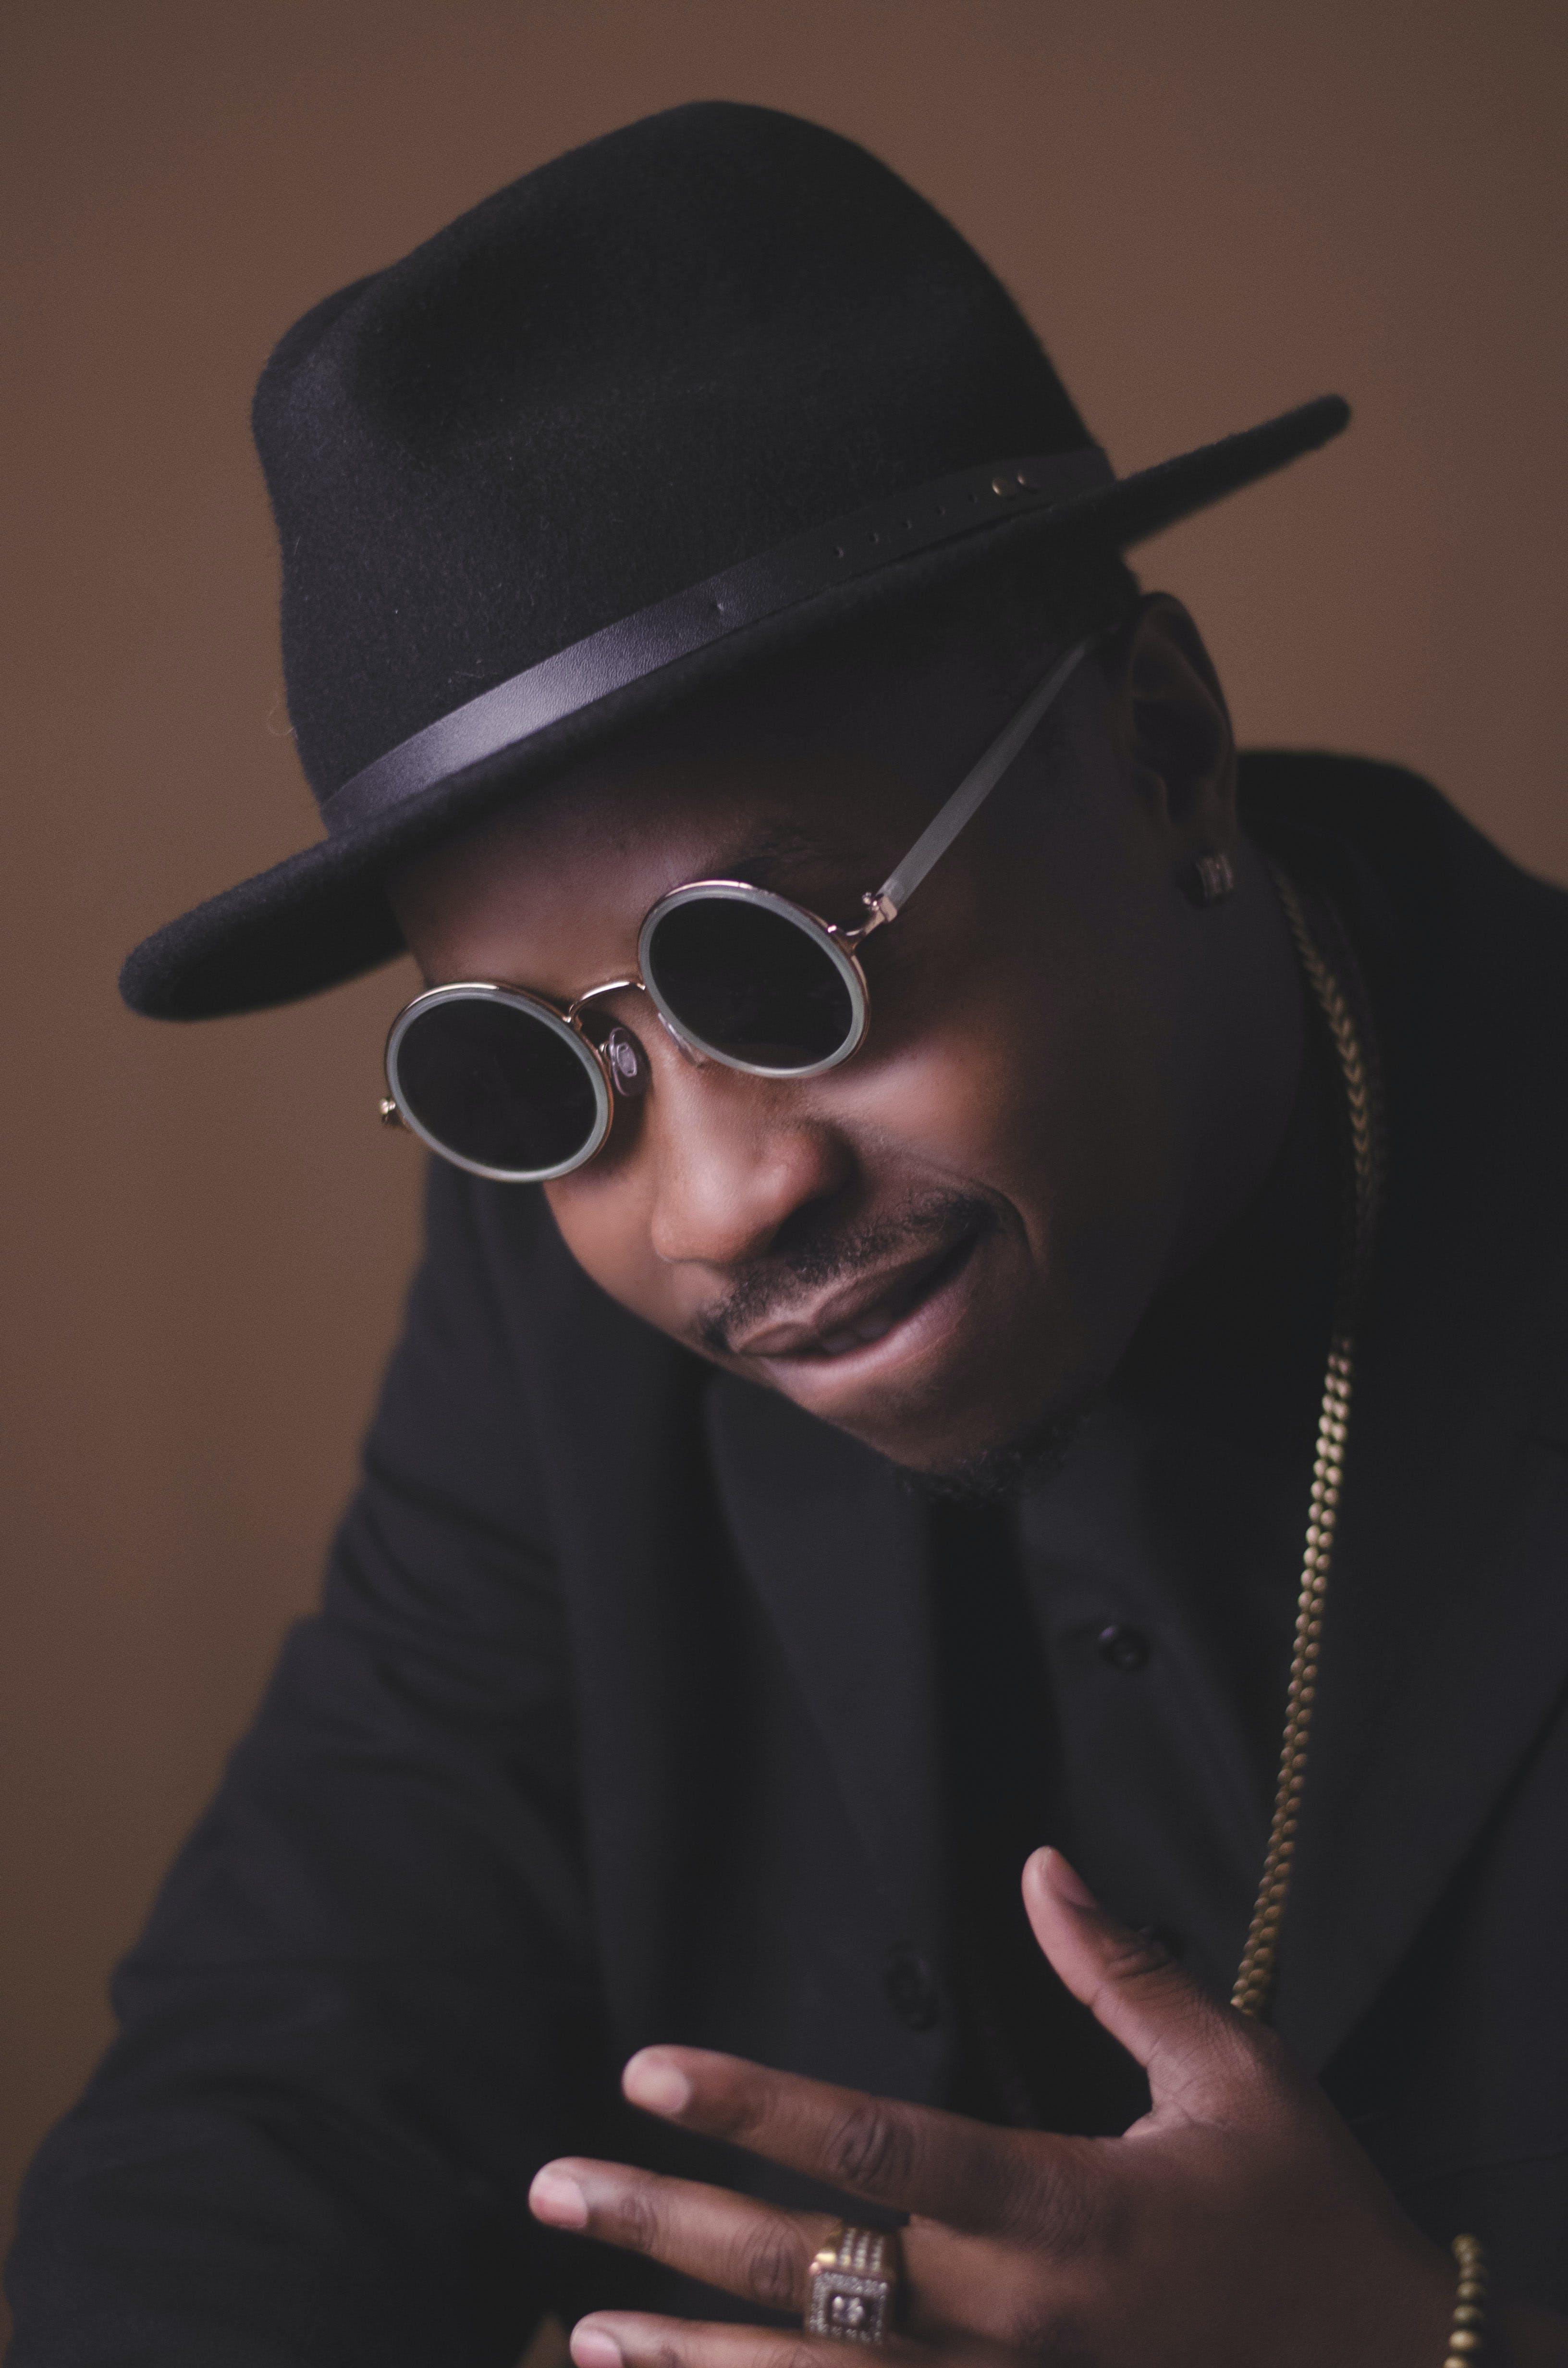 Man Wearing Sunglasses And Black Hat